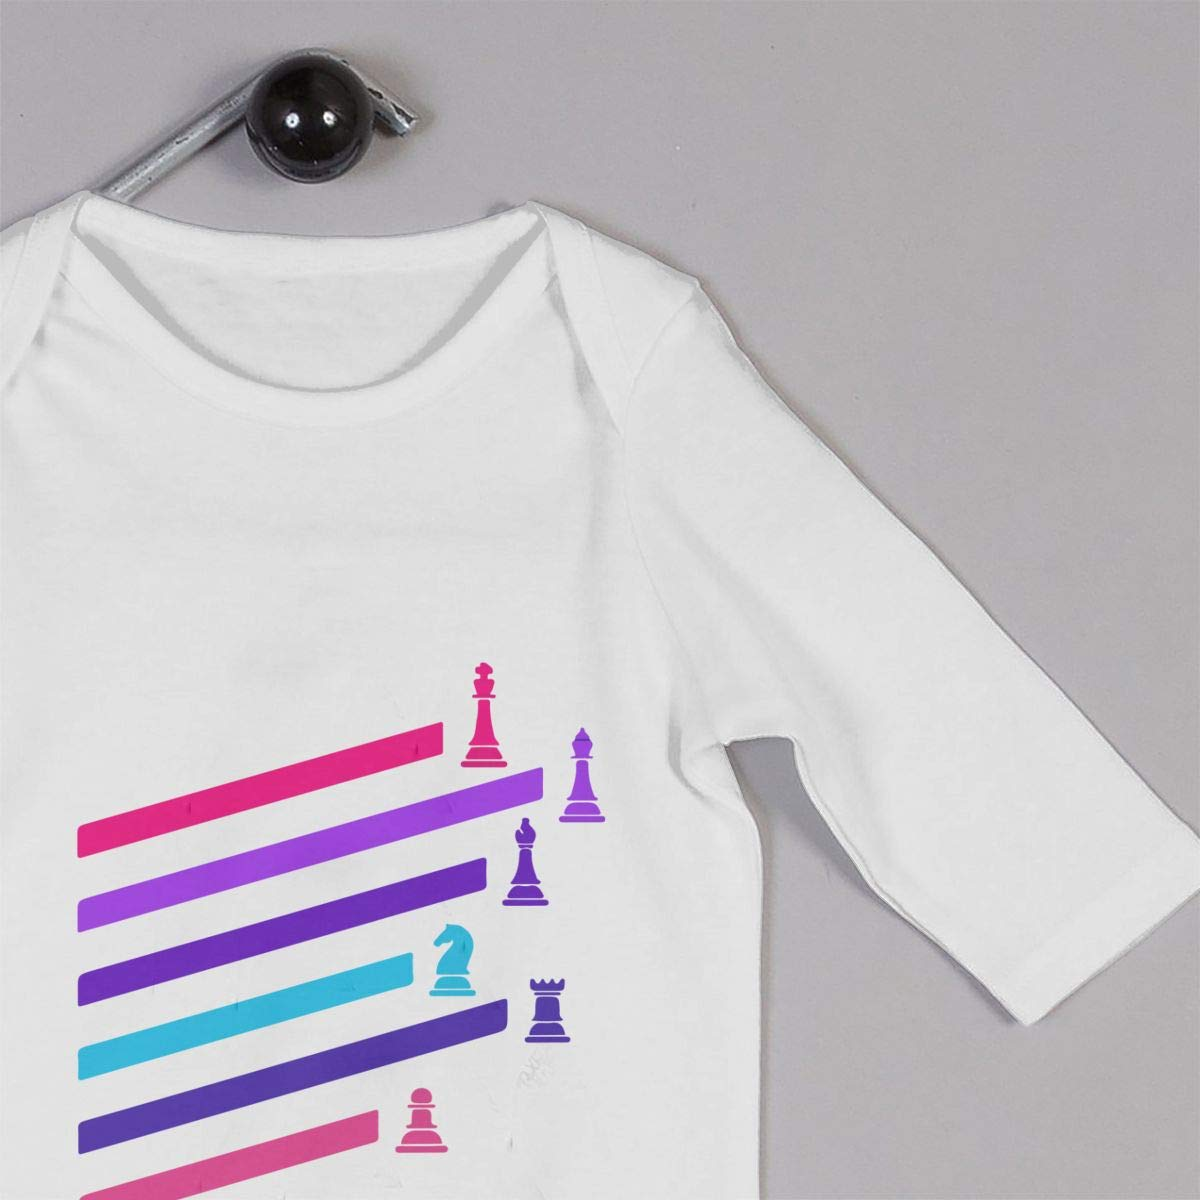 Mri-le1 Baby Girl Bodysuits Cyberpunk Neon Chess Pieces Kid Pajamas